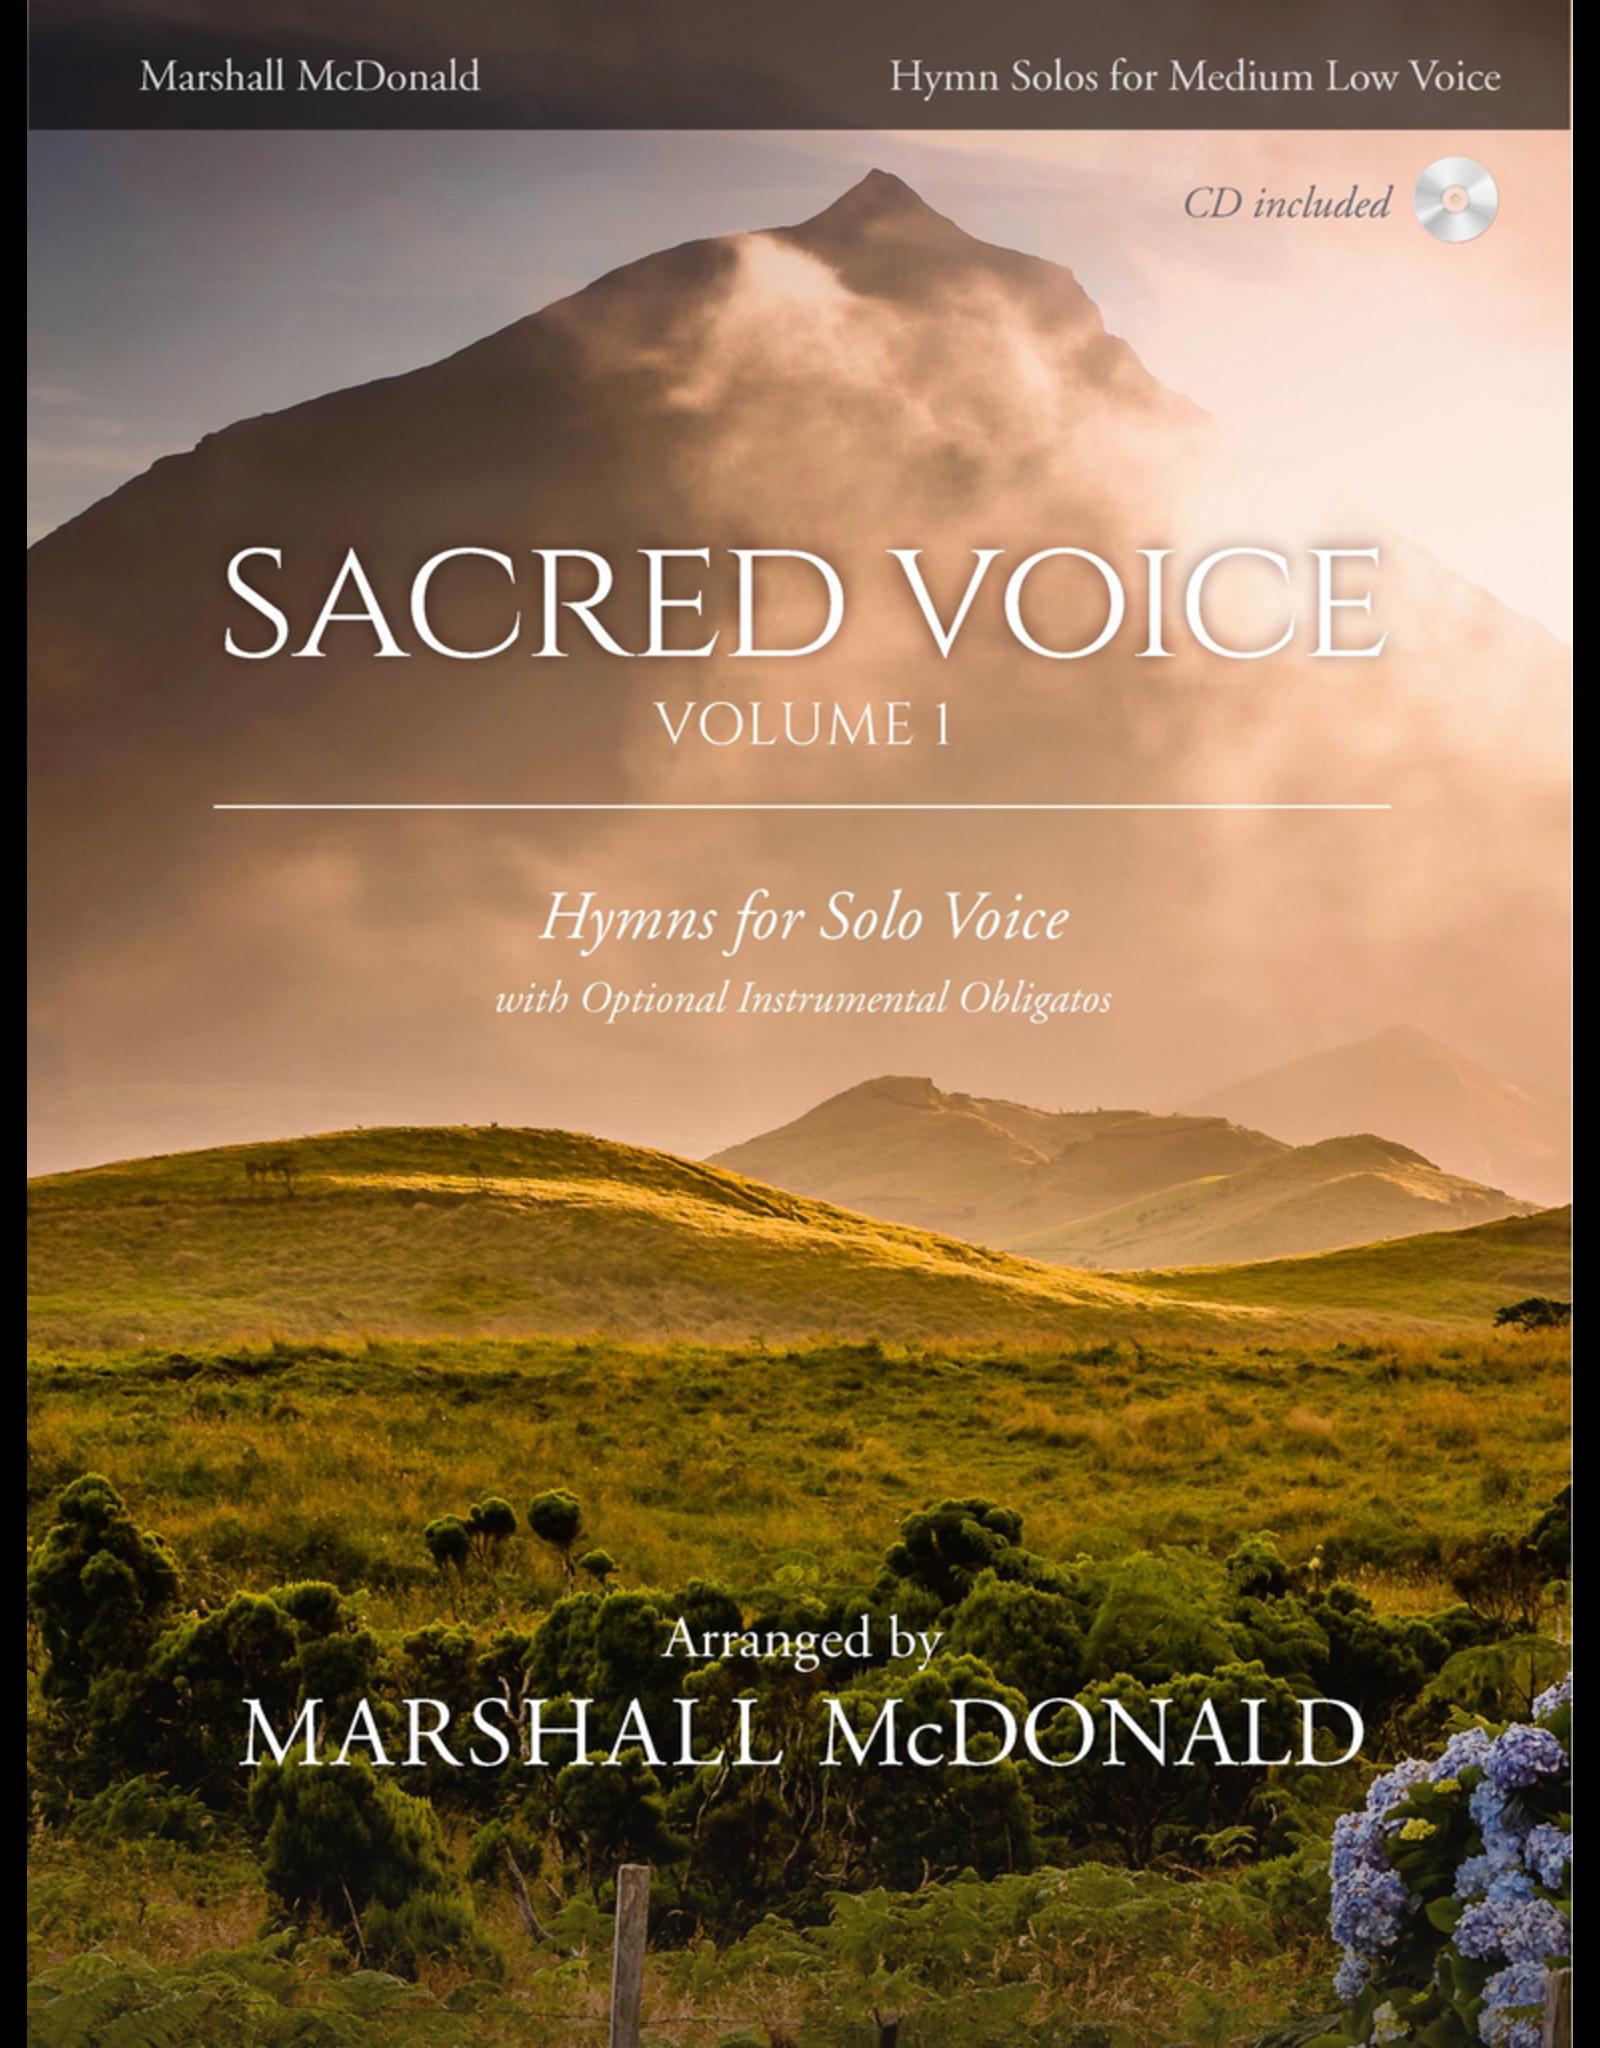 Marshall McDonald Music Sacred Voice Volume I for Medium Low Voice arr. Marshall McDonald